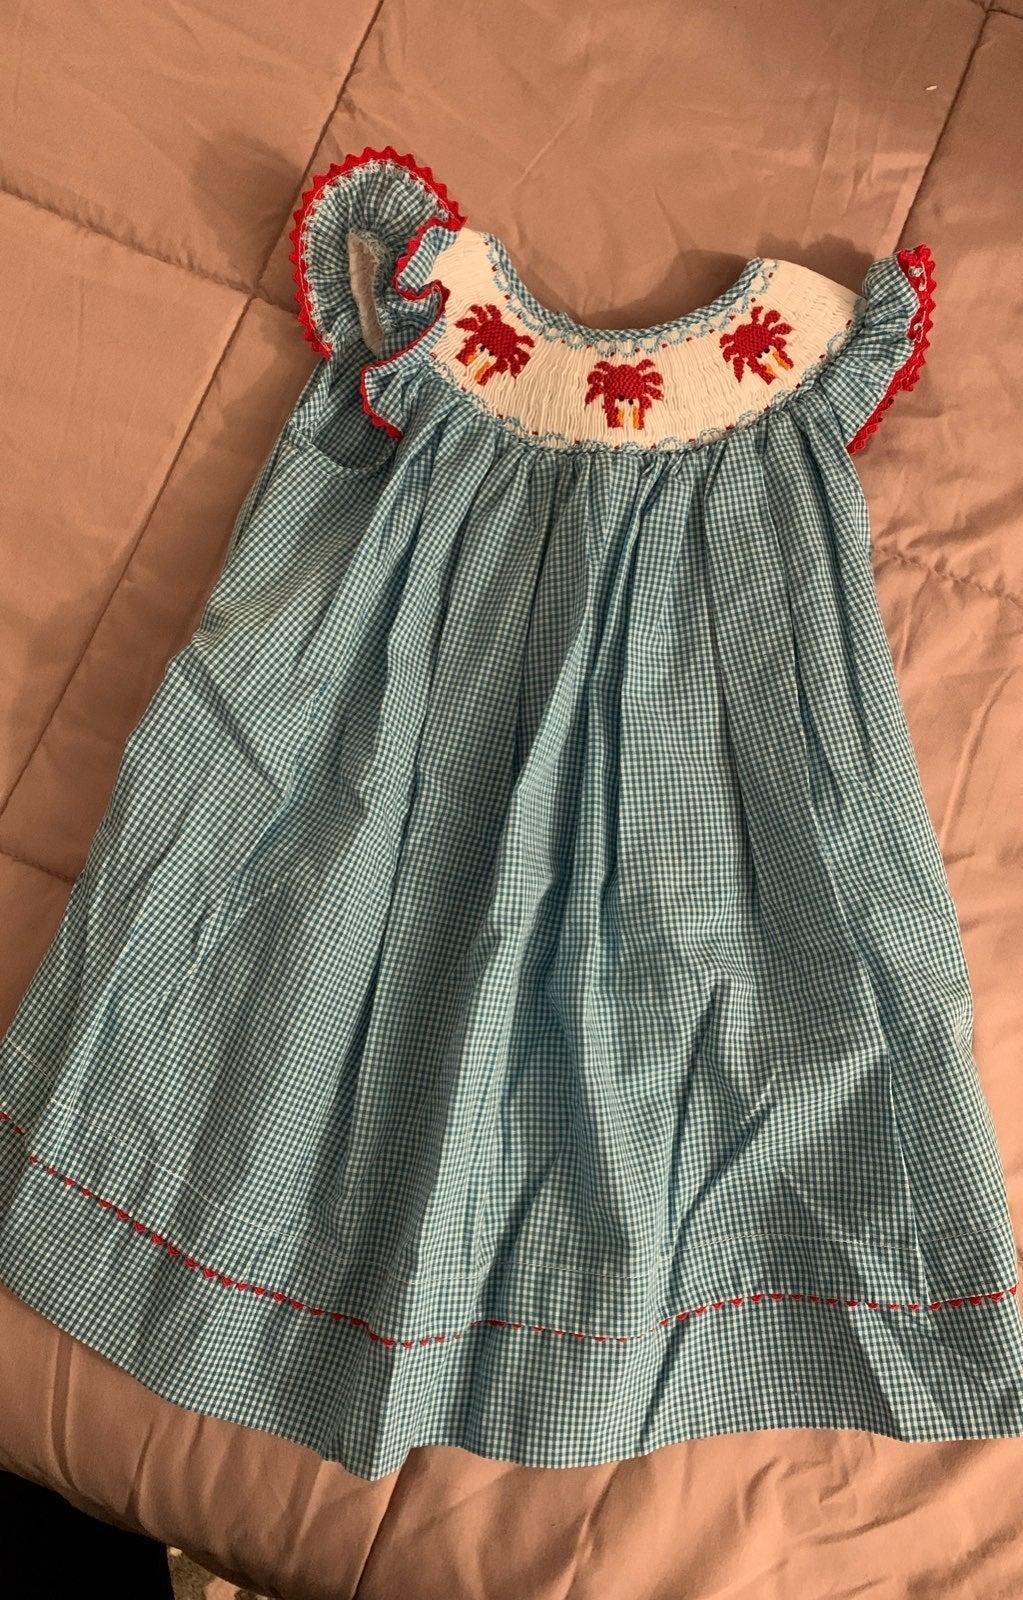 Crab dress